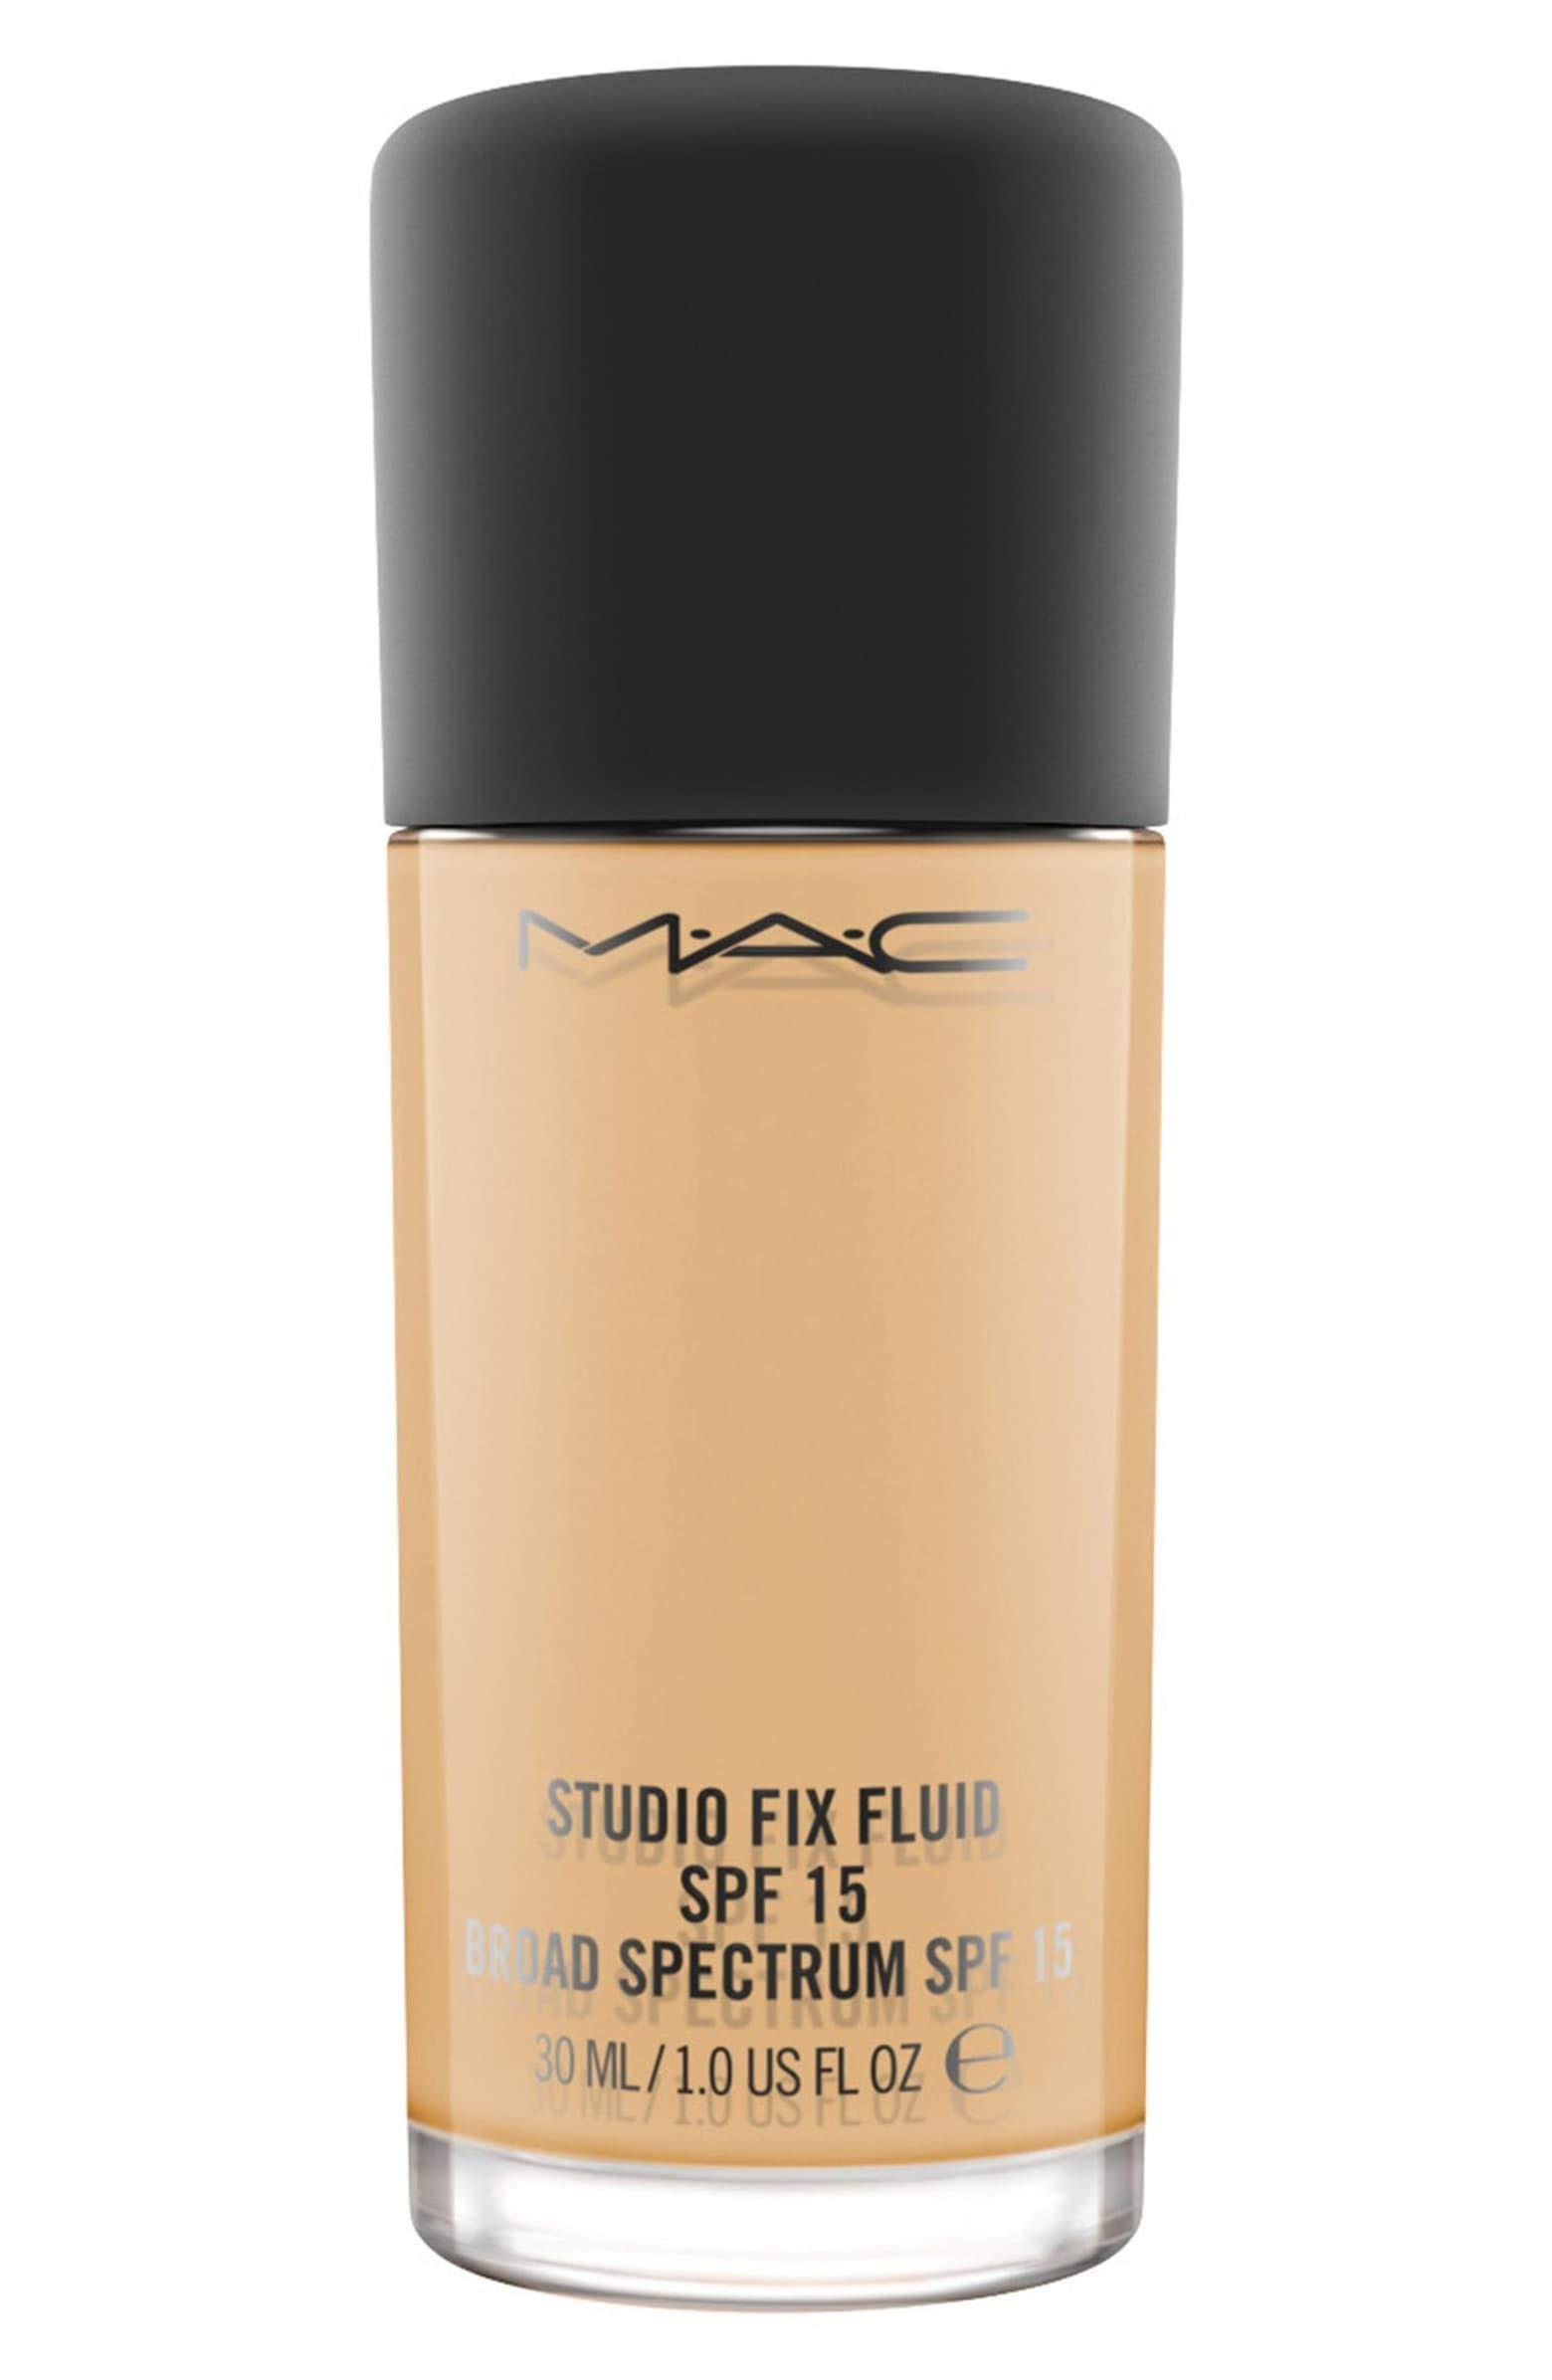 MAC Studio Fix Fluid Foundation SPF15, NC30, 1 Fl Oz (SG_B0774629X7_US)